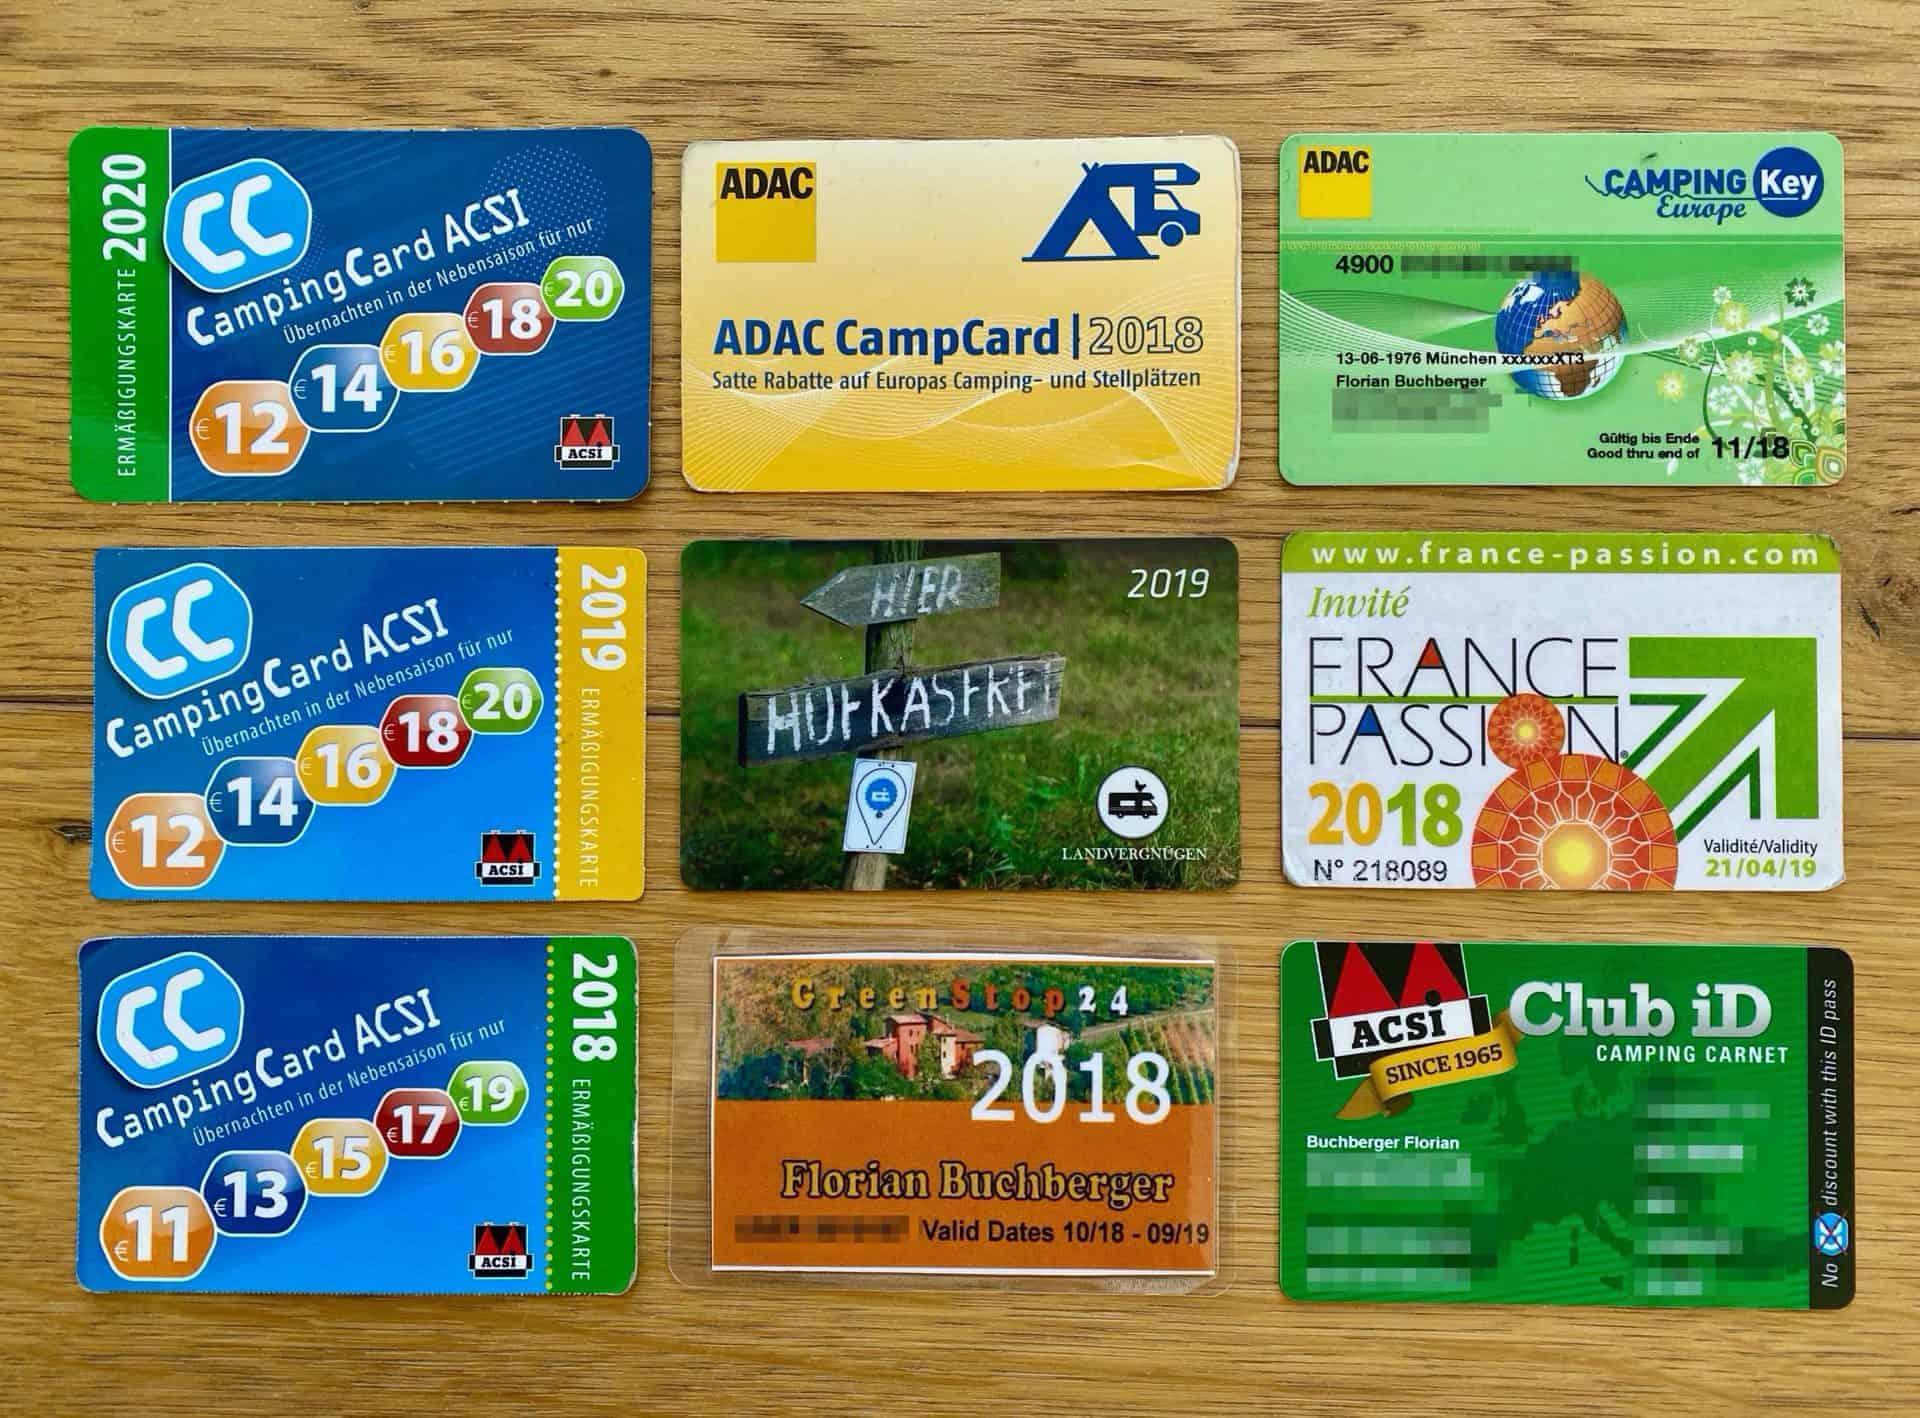 ACSI_ADAC_CKE_CLUBID_FRANCE_PASSION_GREENSTOP24_LANDVERGNÜGEN